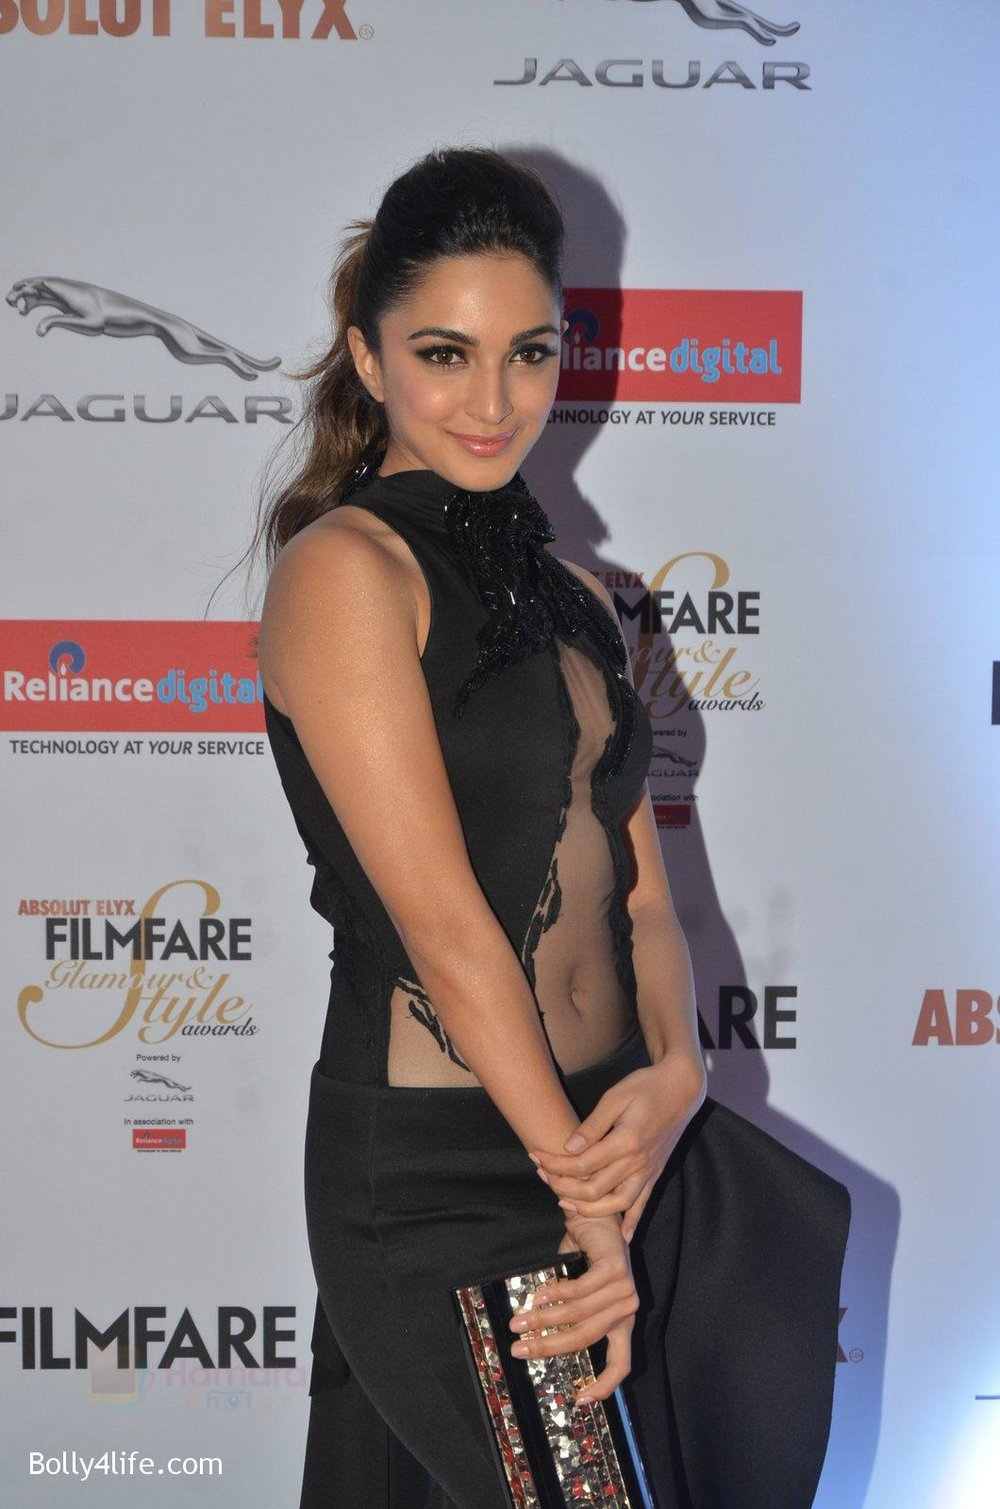 Kiara-Advani-at-Filmfare-Glamour-Style-Awards-2016-in-Mumbai-on-15th-Oct-2016-1497.jpg